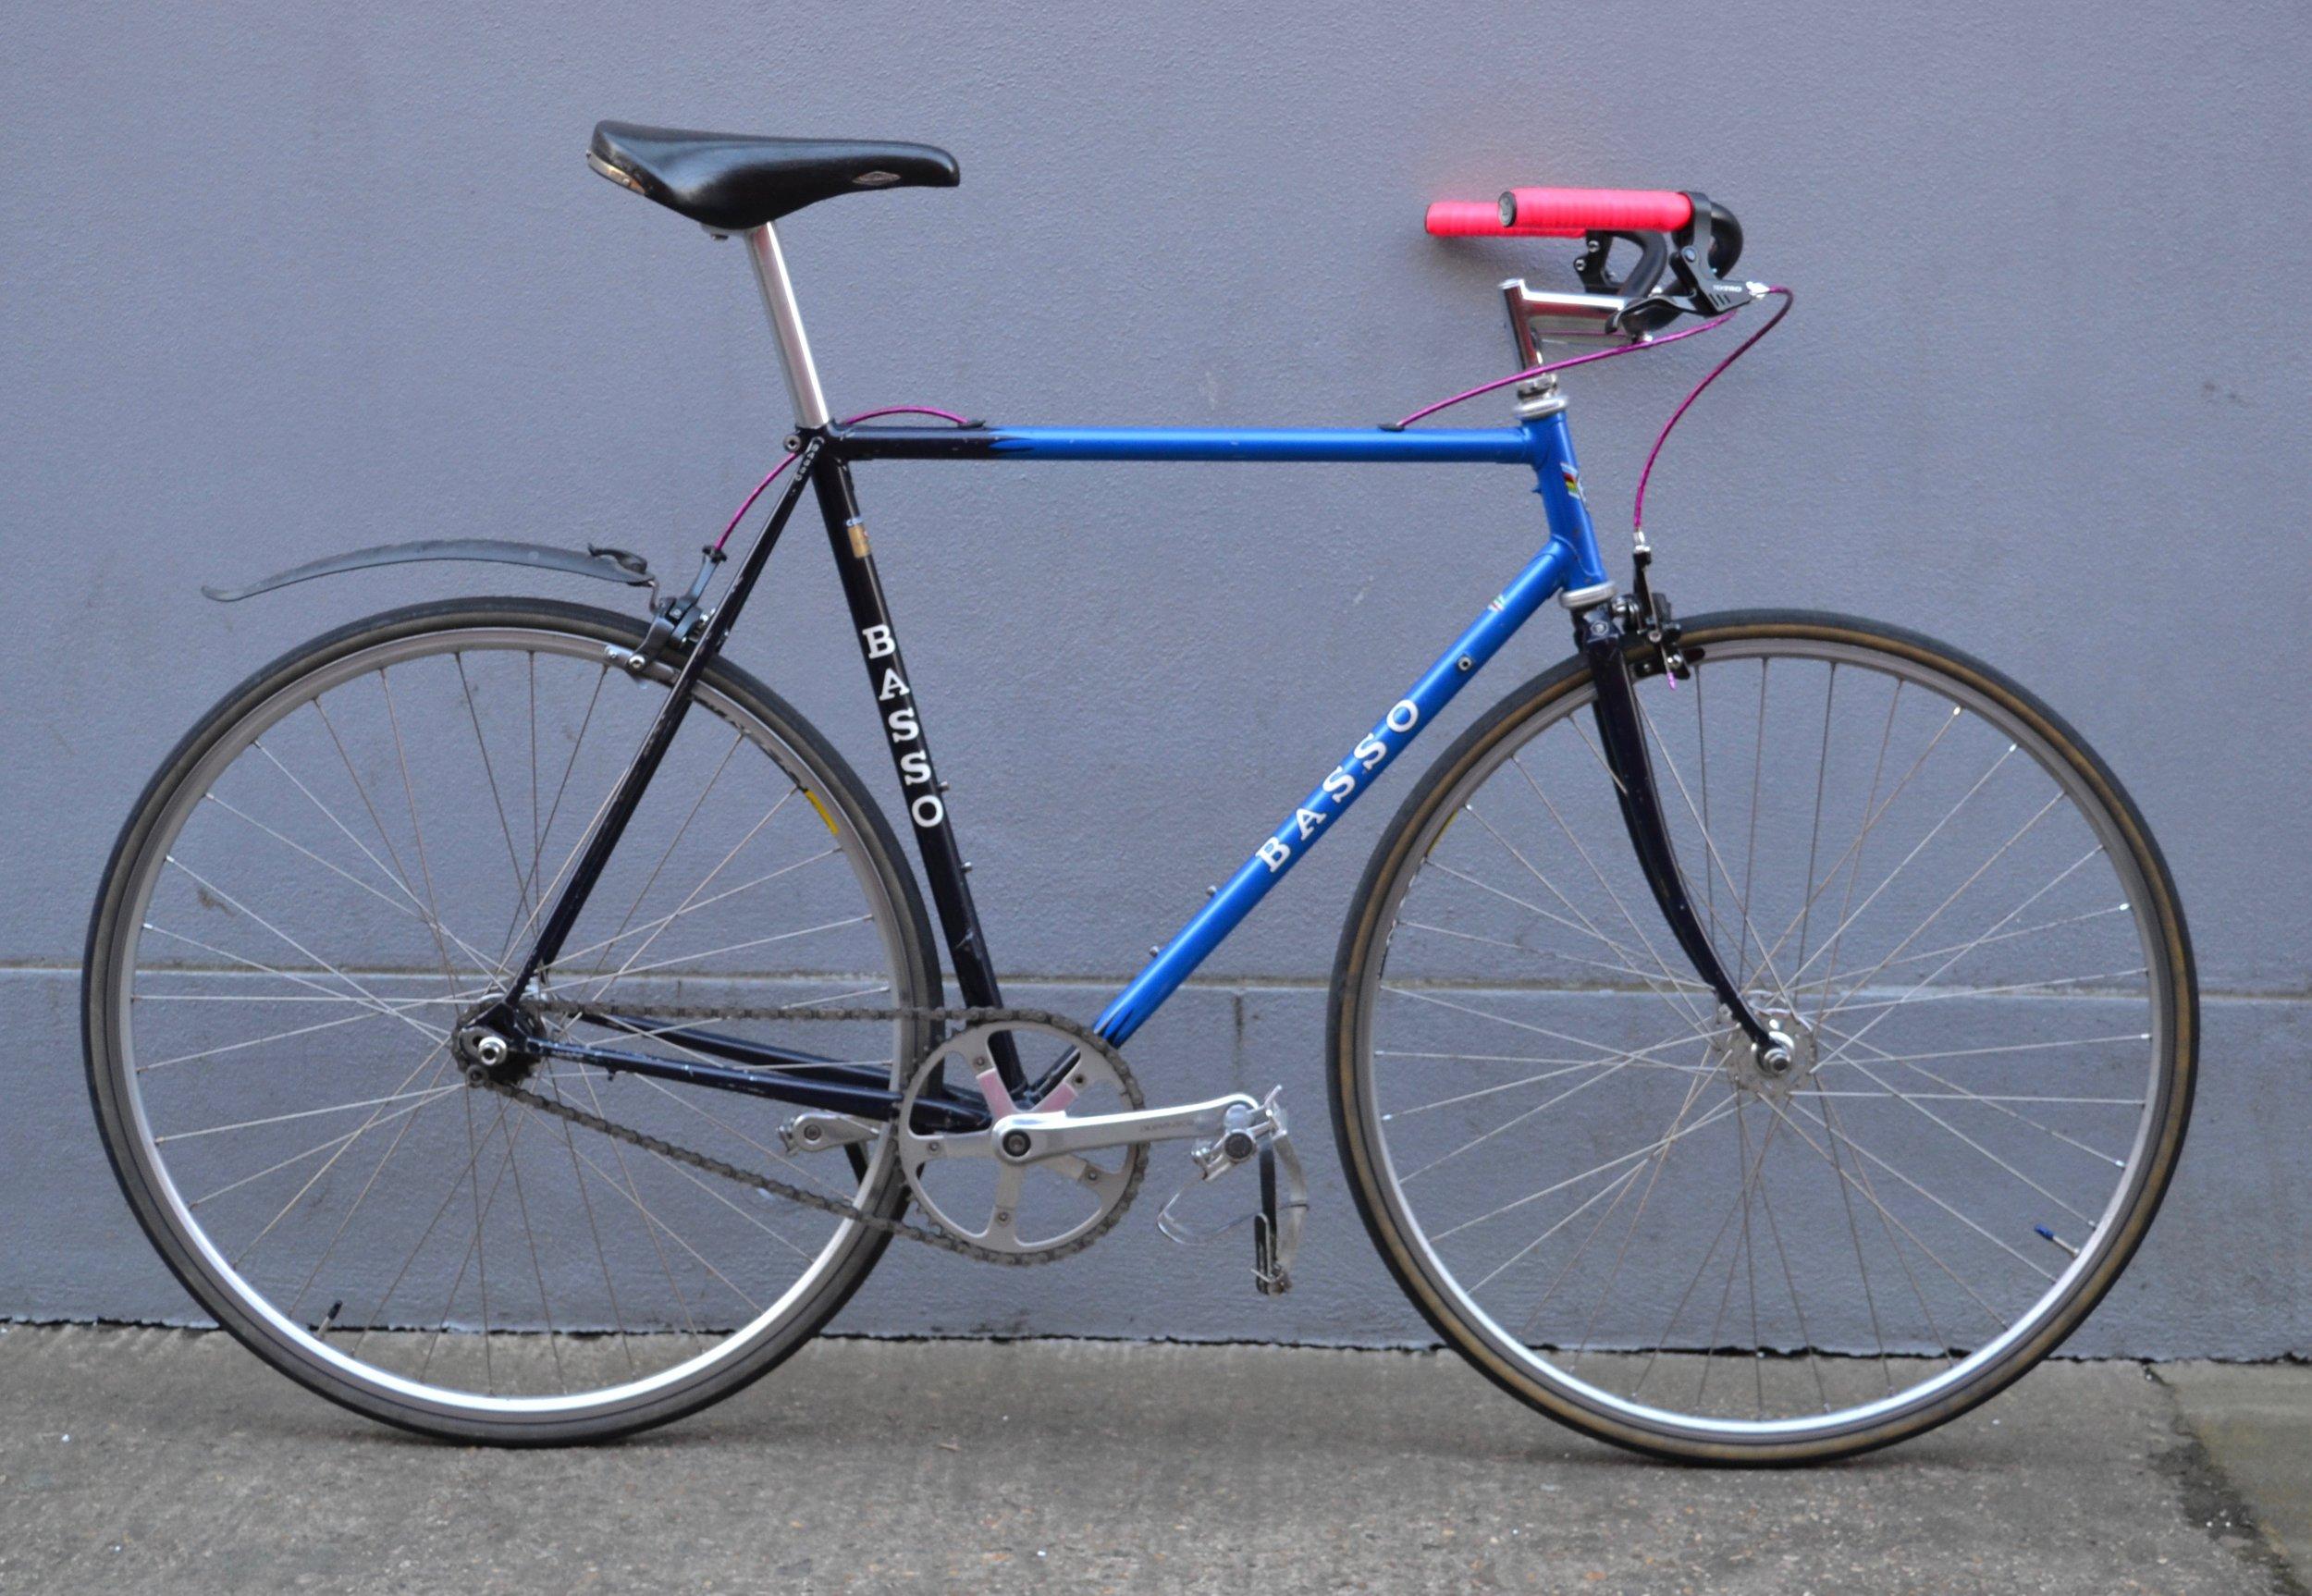 Basso_Columbus_SL_55cm_Frame_Single_speed_Big_Fun_bikes_haggerston.jpg